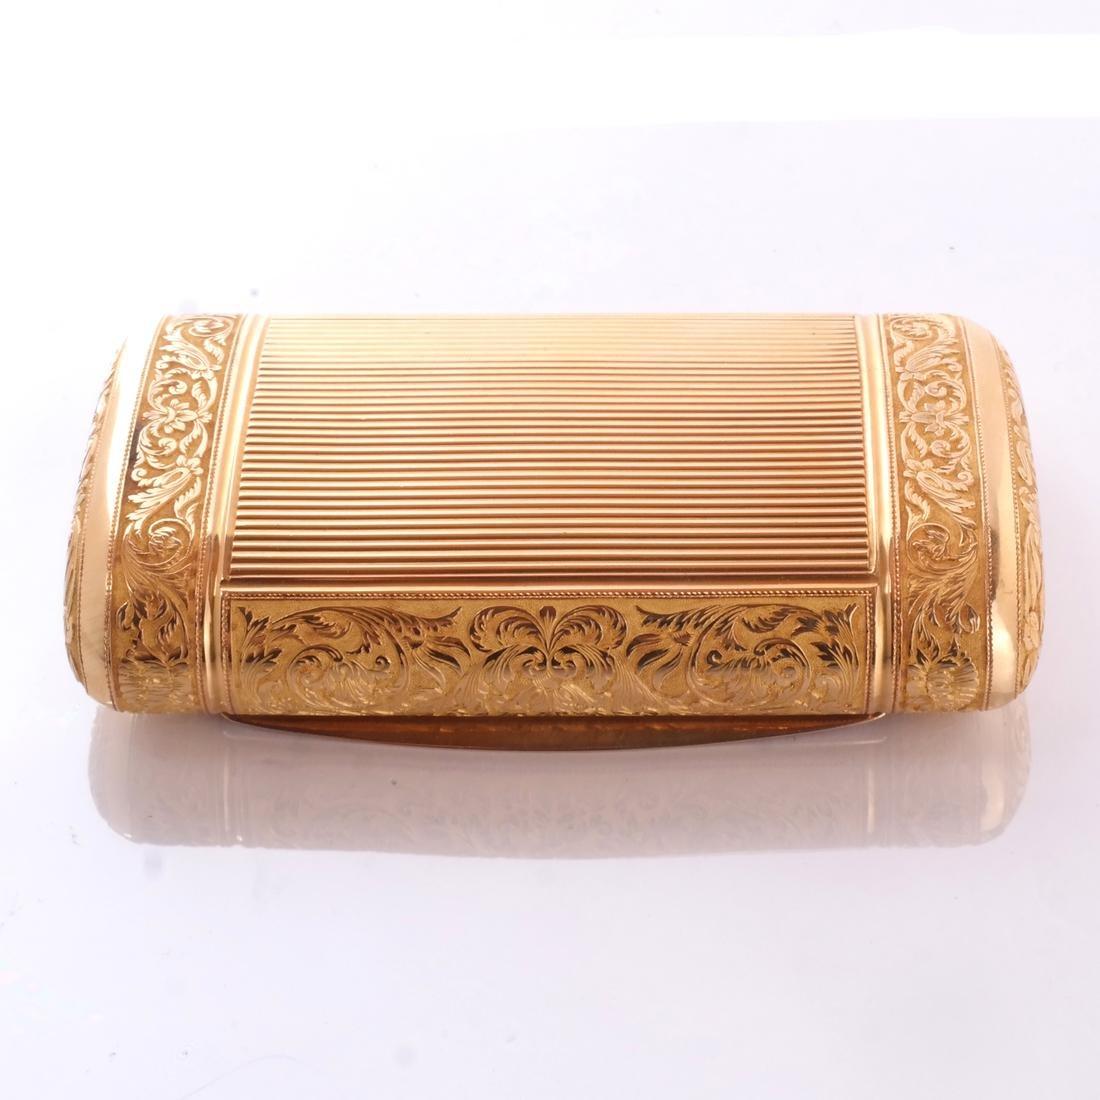 French 18k Gold Snuff Box - 2